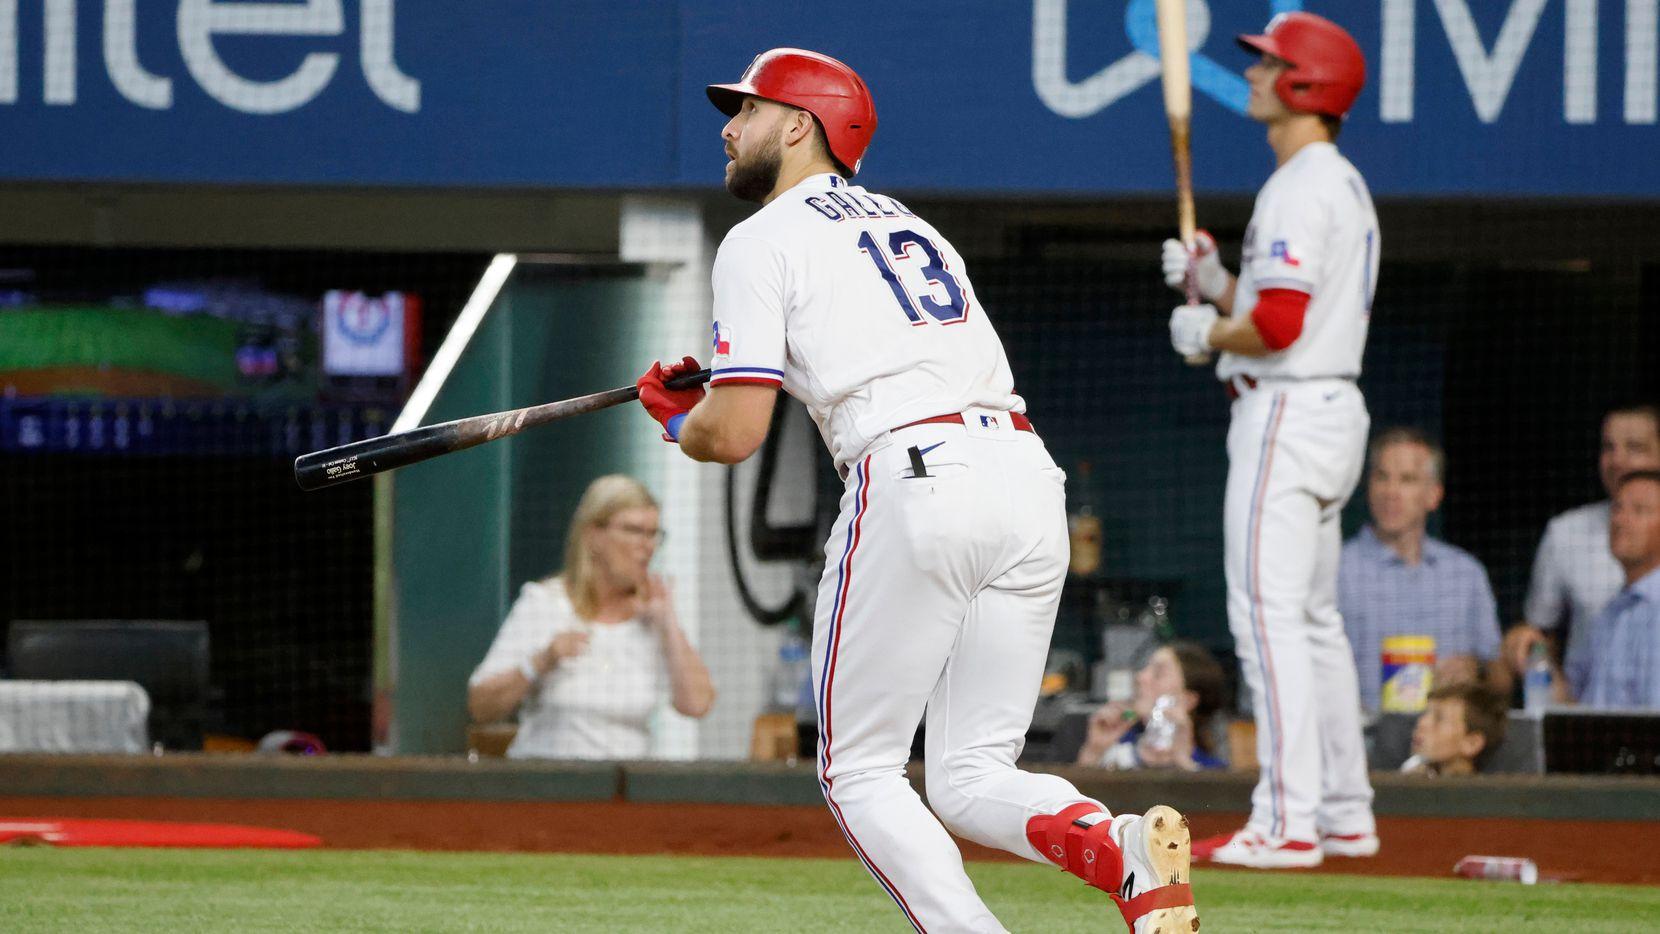 Texas Rangers' Joey Gallo (13) watches his three-run home run against the Kansas City Royals during the fourth inning of a baseball game Saturday, June 26, 2021, in Arlington, Texas. (AP Photo/Michael Ainsworth)